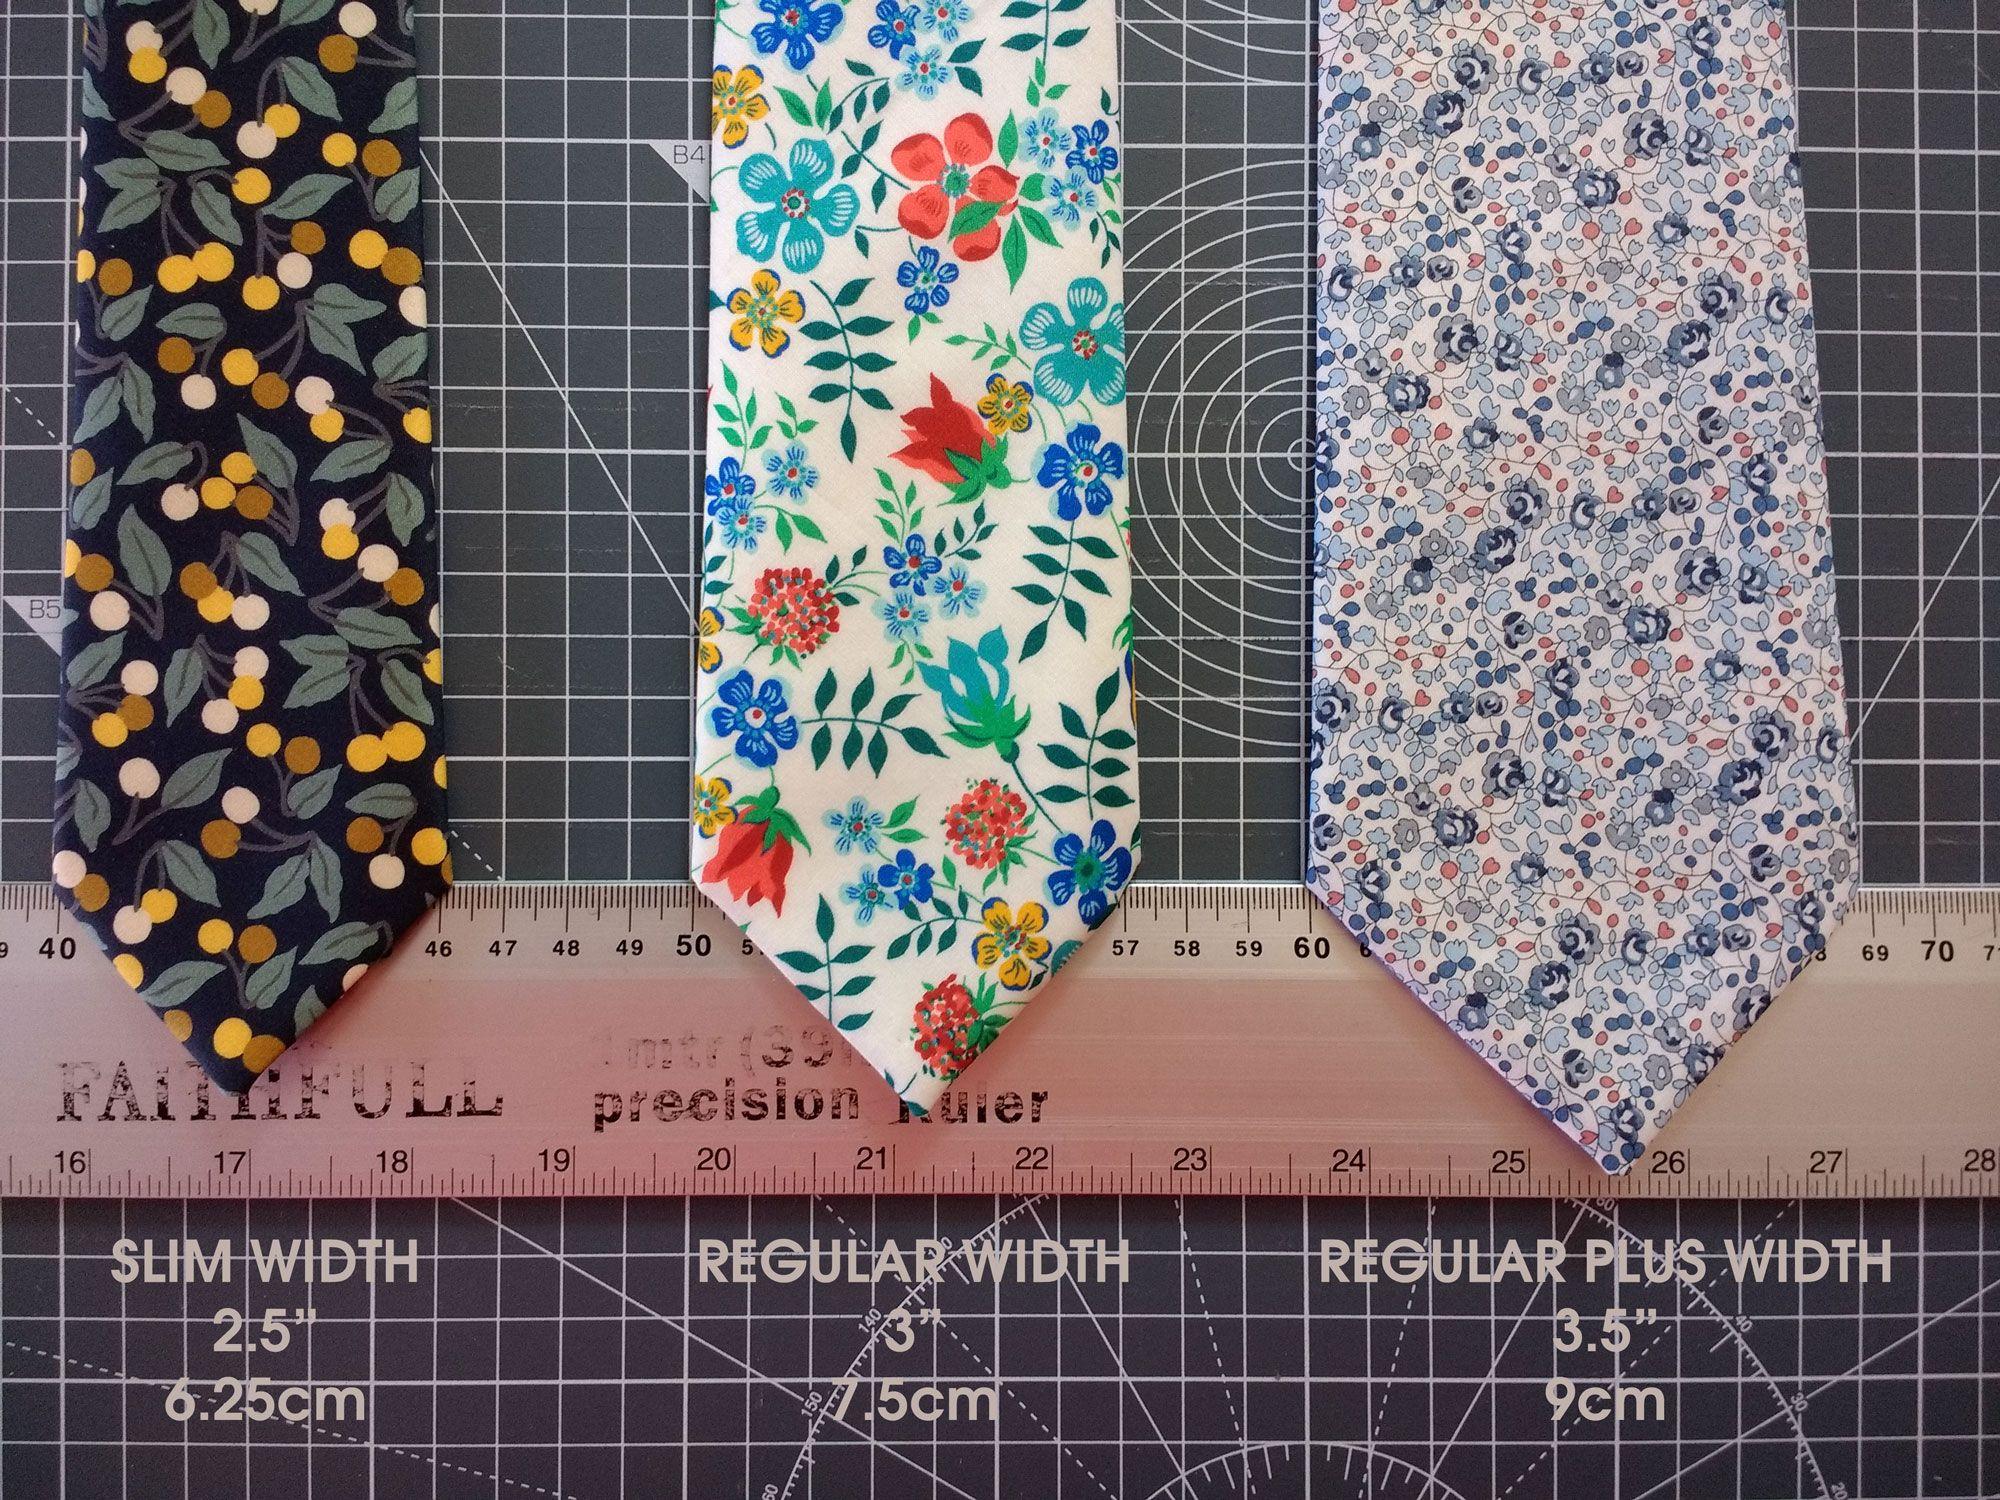 3 standard widths of CatkinJane ties